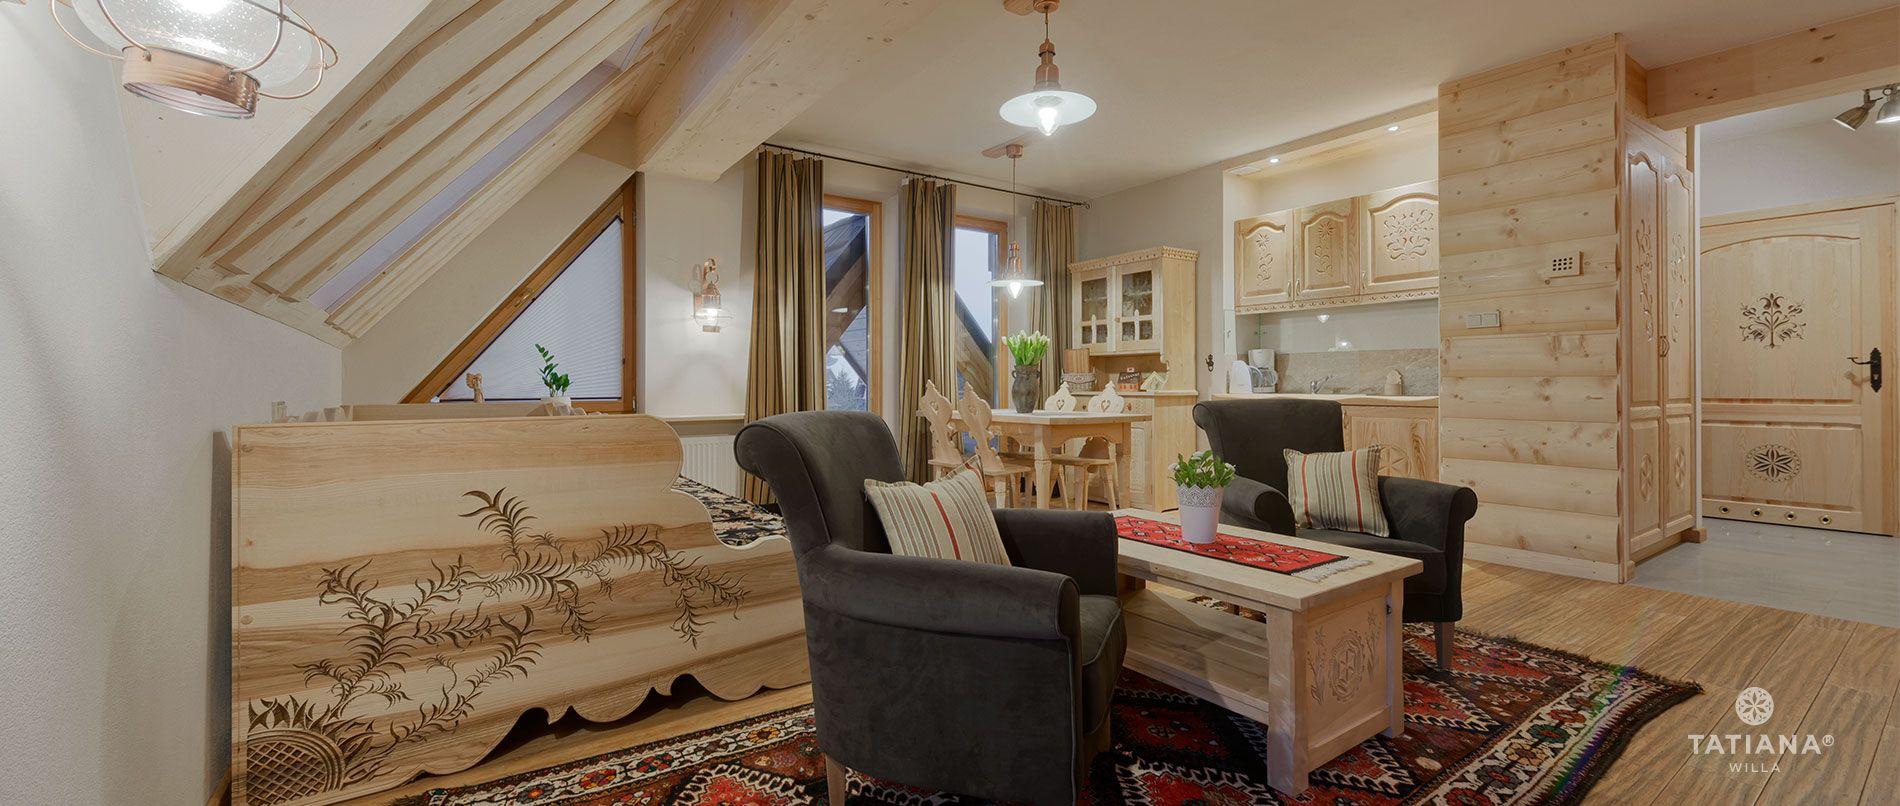 Apartament Lux 16- salon wraz z aneksem kuchennym